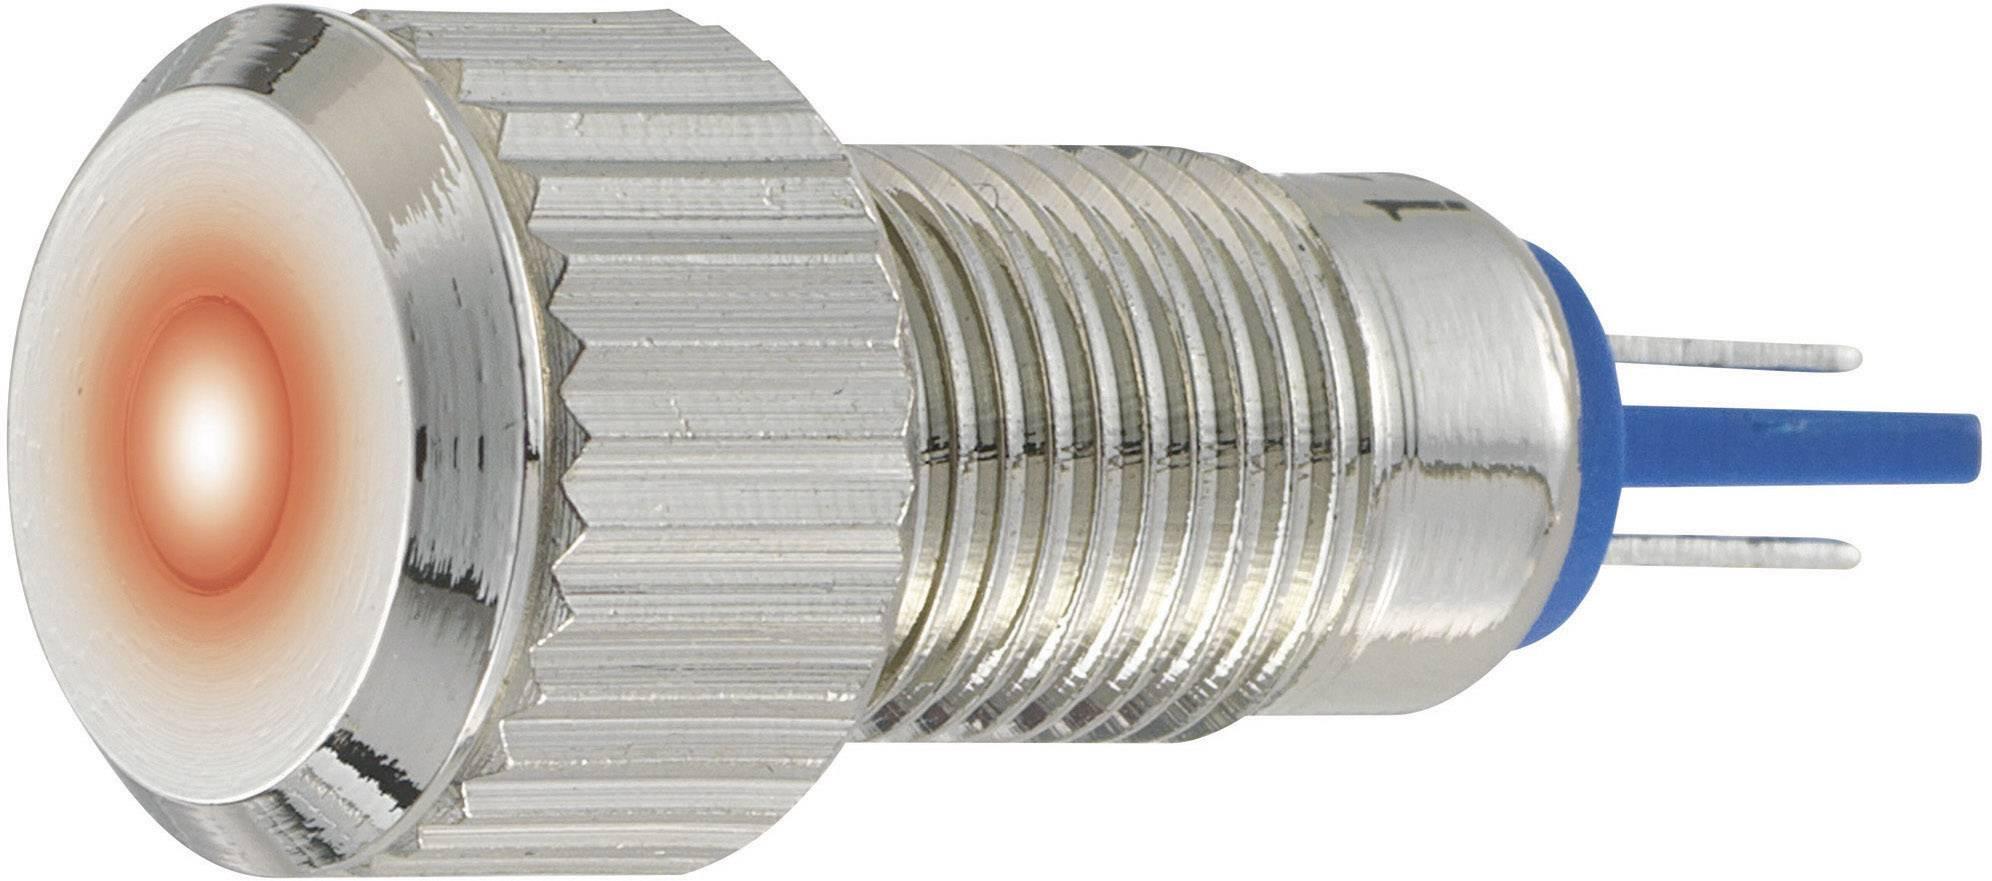 IndikačnéLED TRU COMPONENTS GQ8F-D/G/24V/N, 24 V/DC, 24 V/AC, zelená